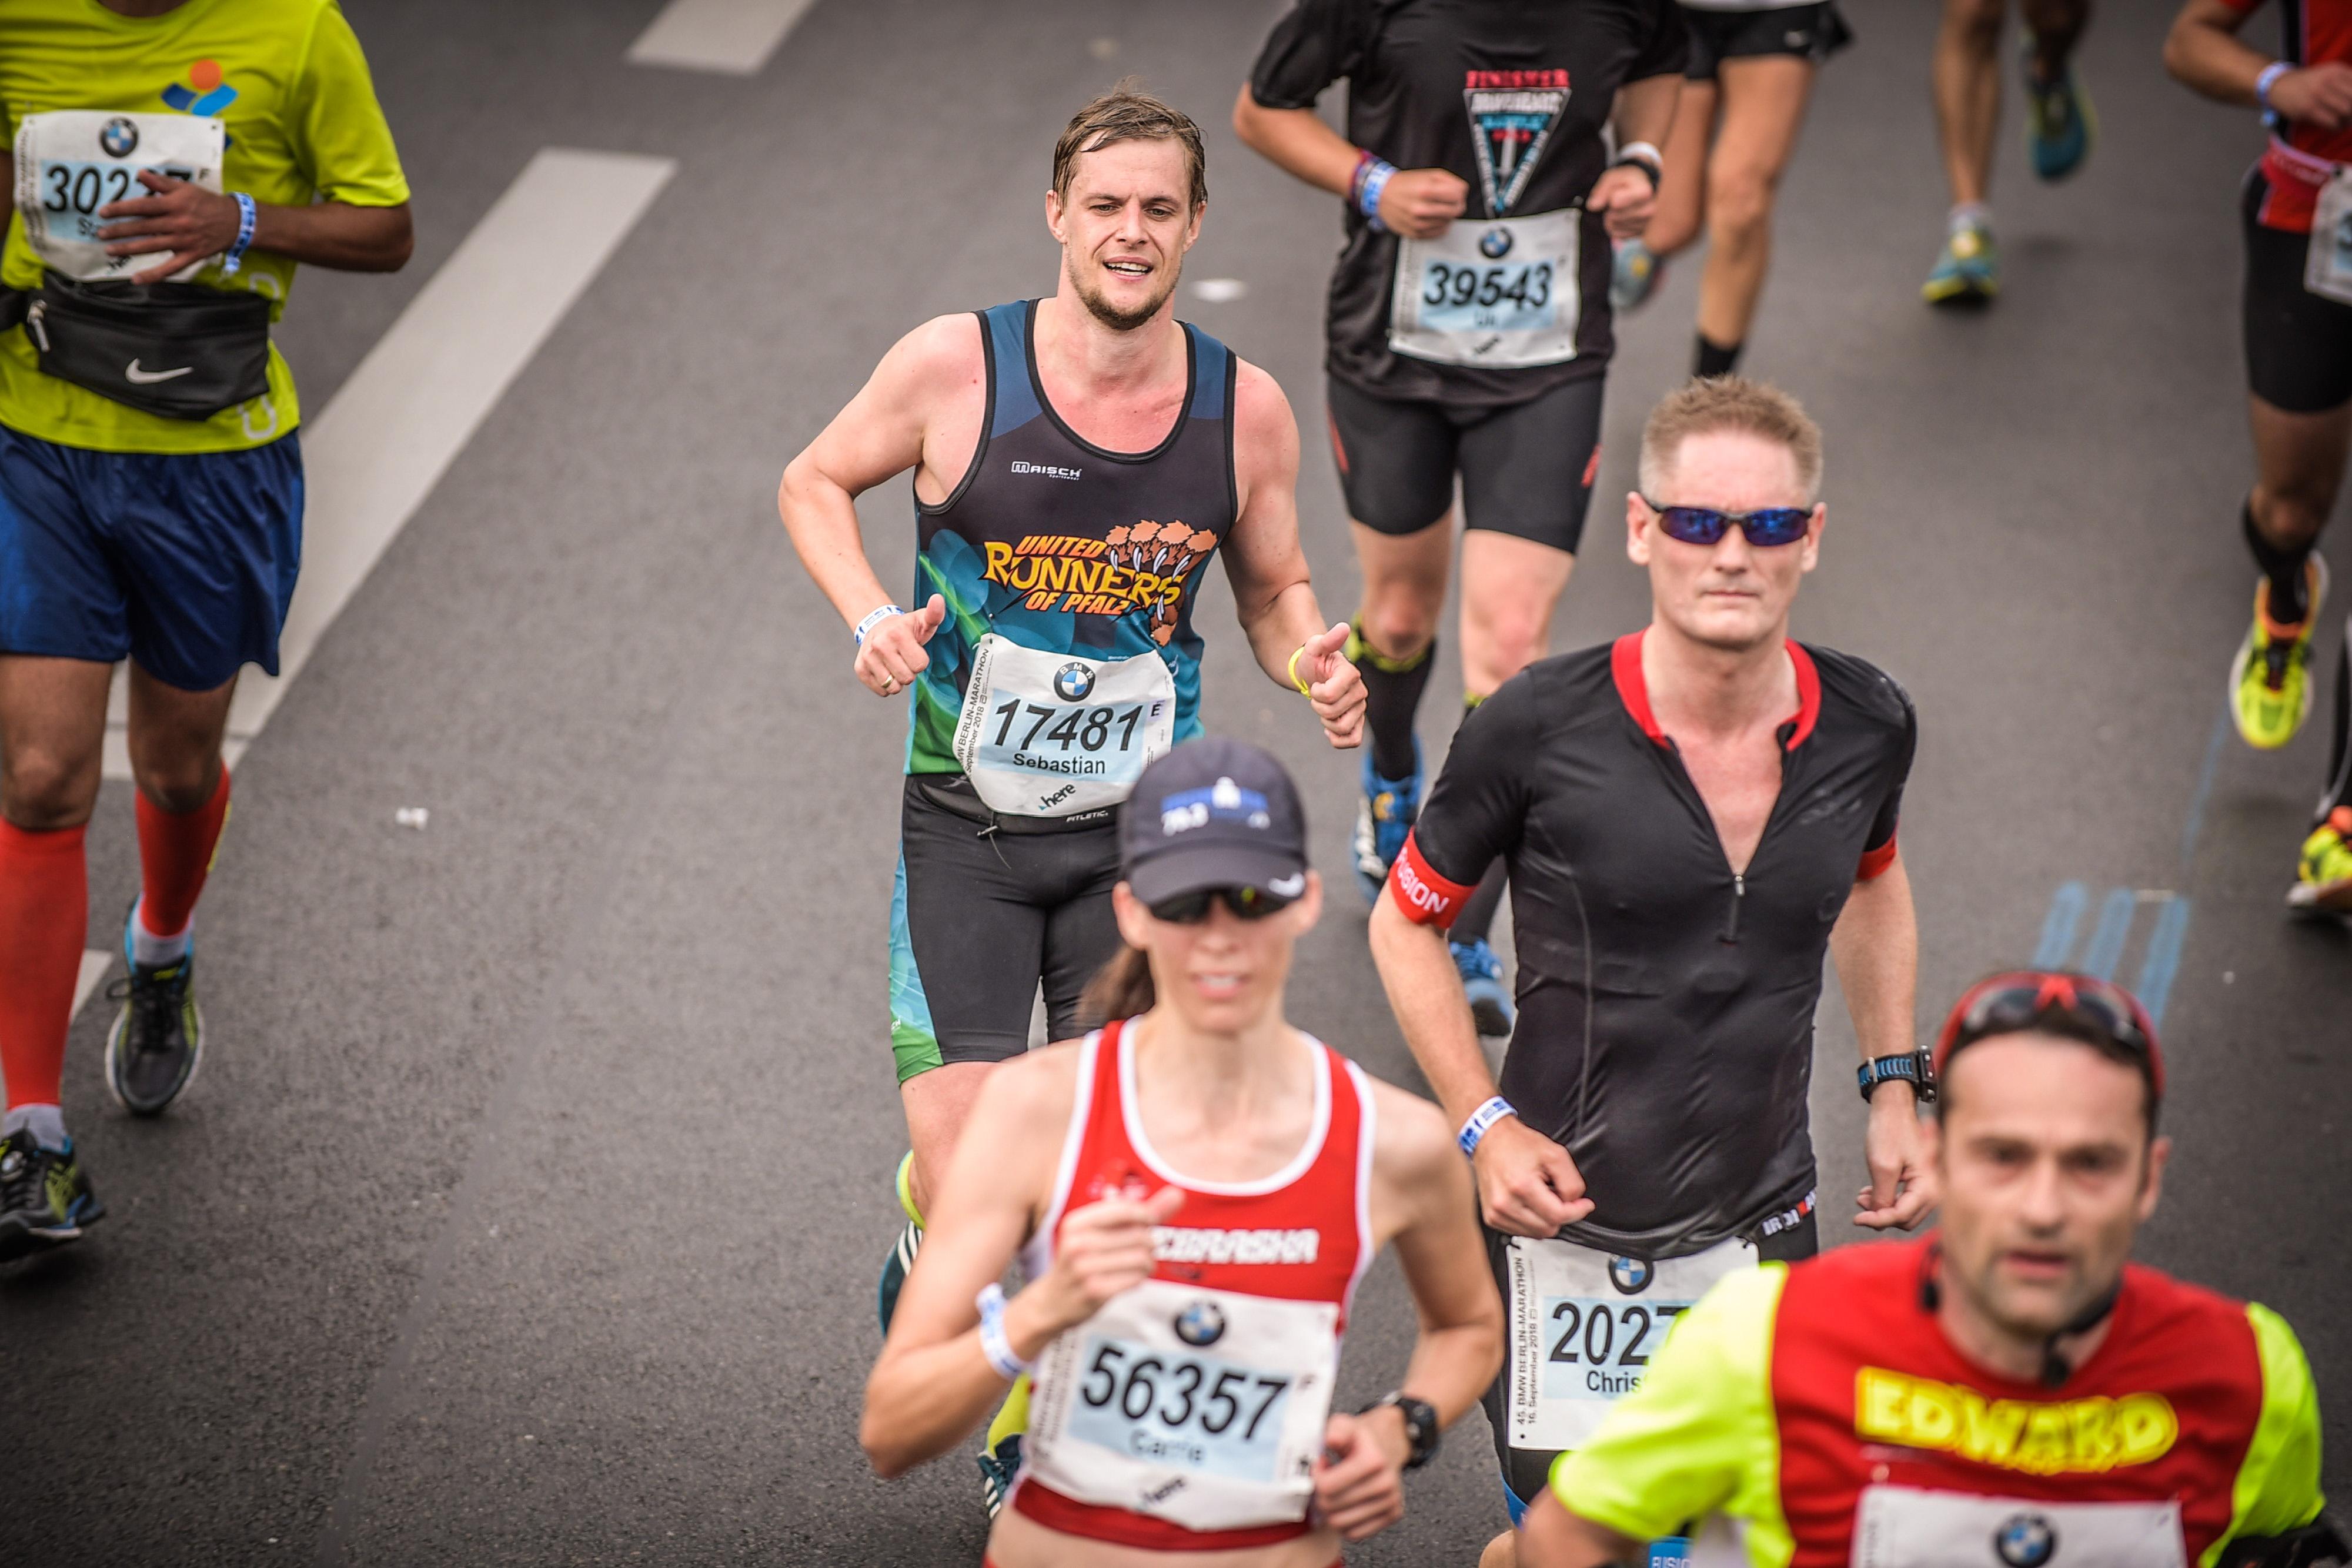 Berlin Marathon 2018 / Credits: sportfotograf.com